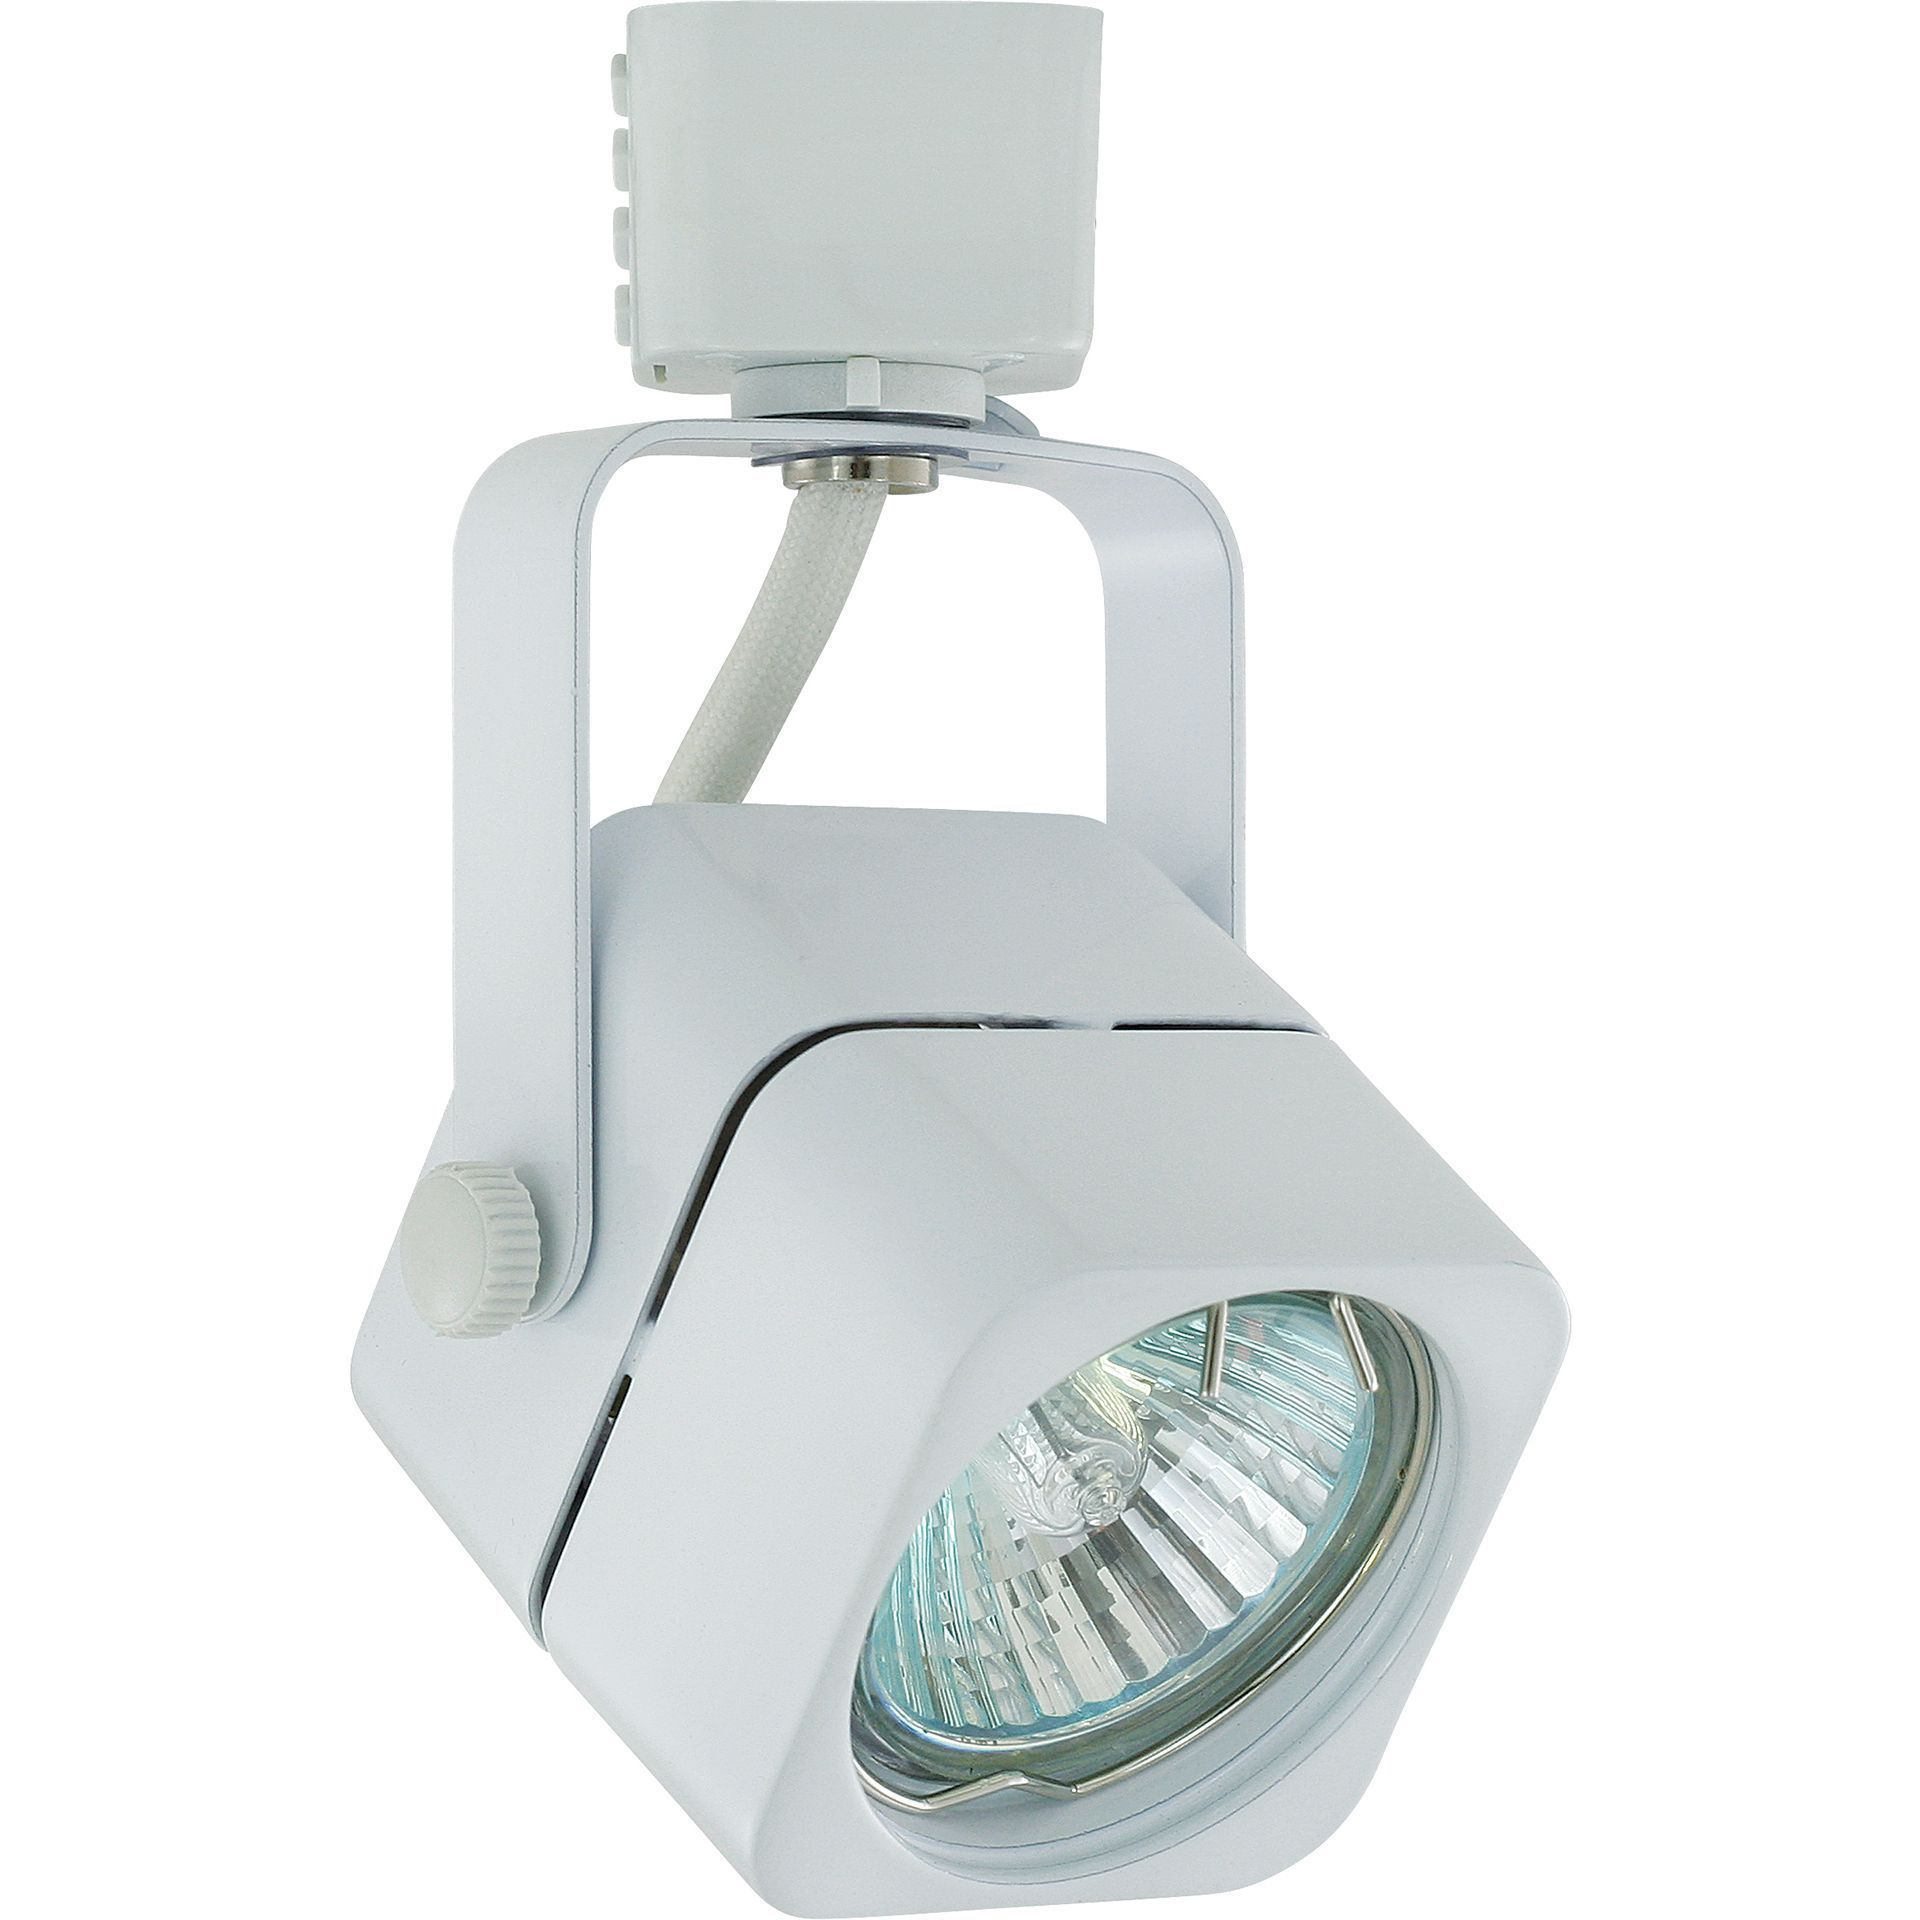 Liteline Corporation 71250 90121 3 White Aluminum Apollo Track Lighting Fixture Lights